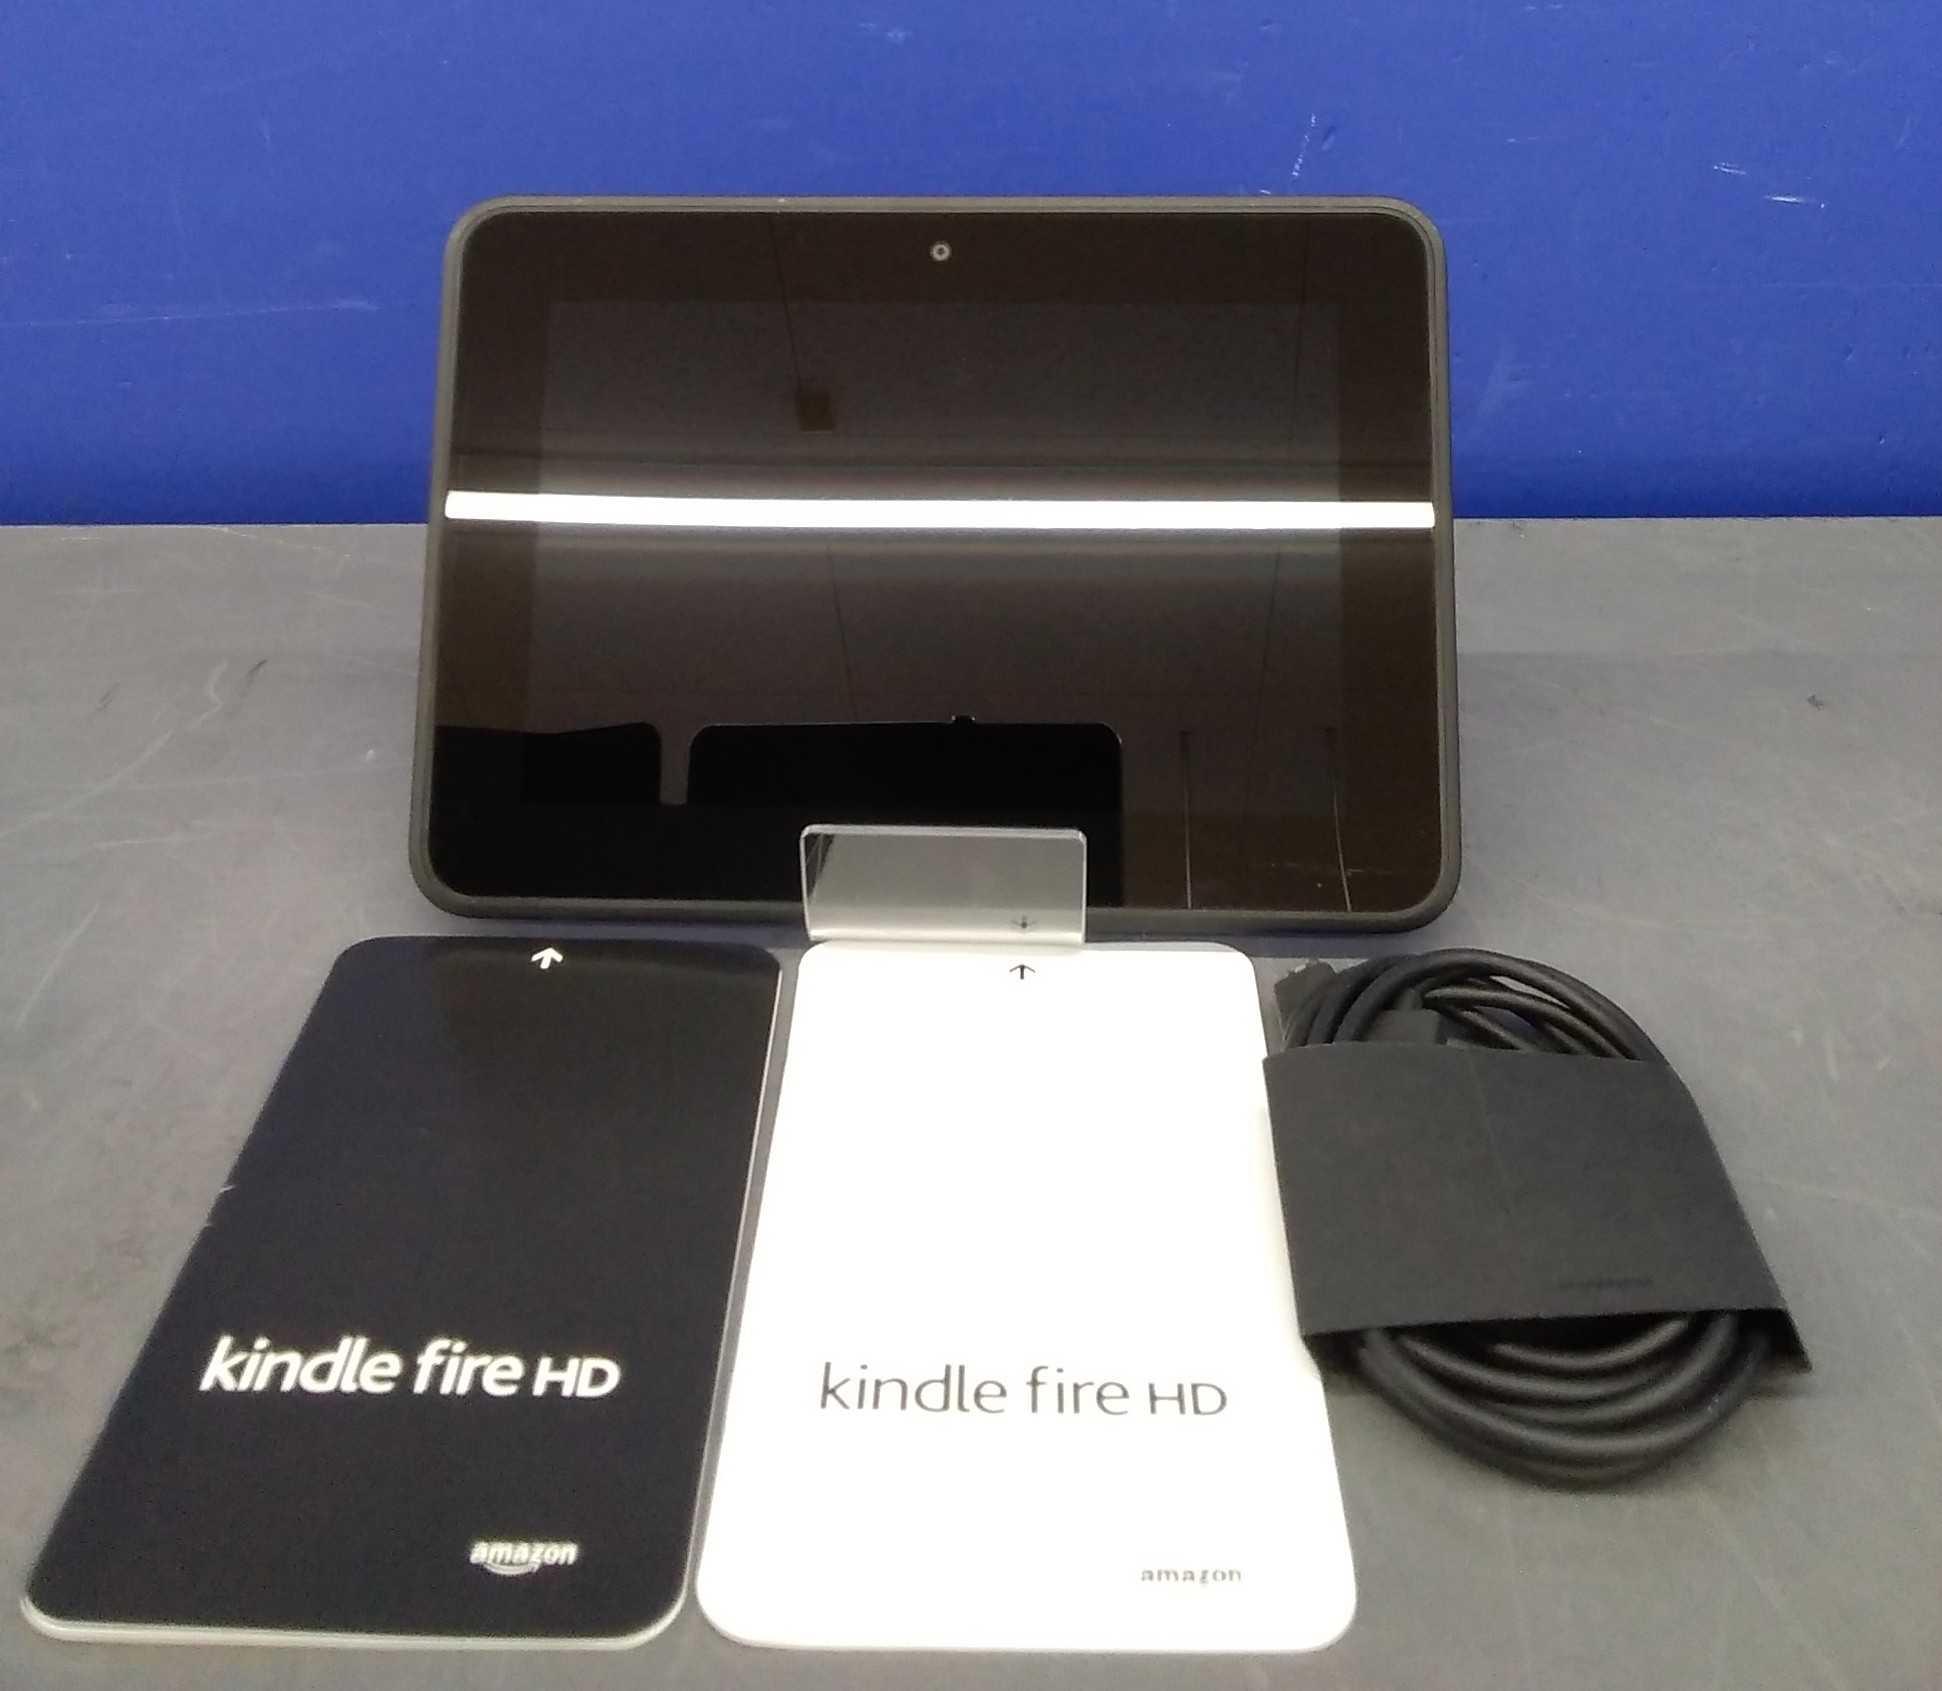 Kindle Fire HD 16GB|AMAZON